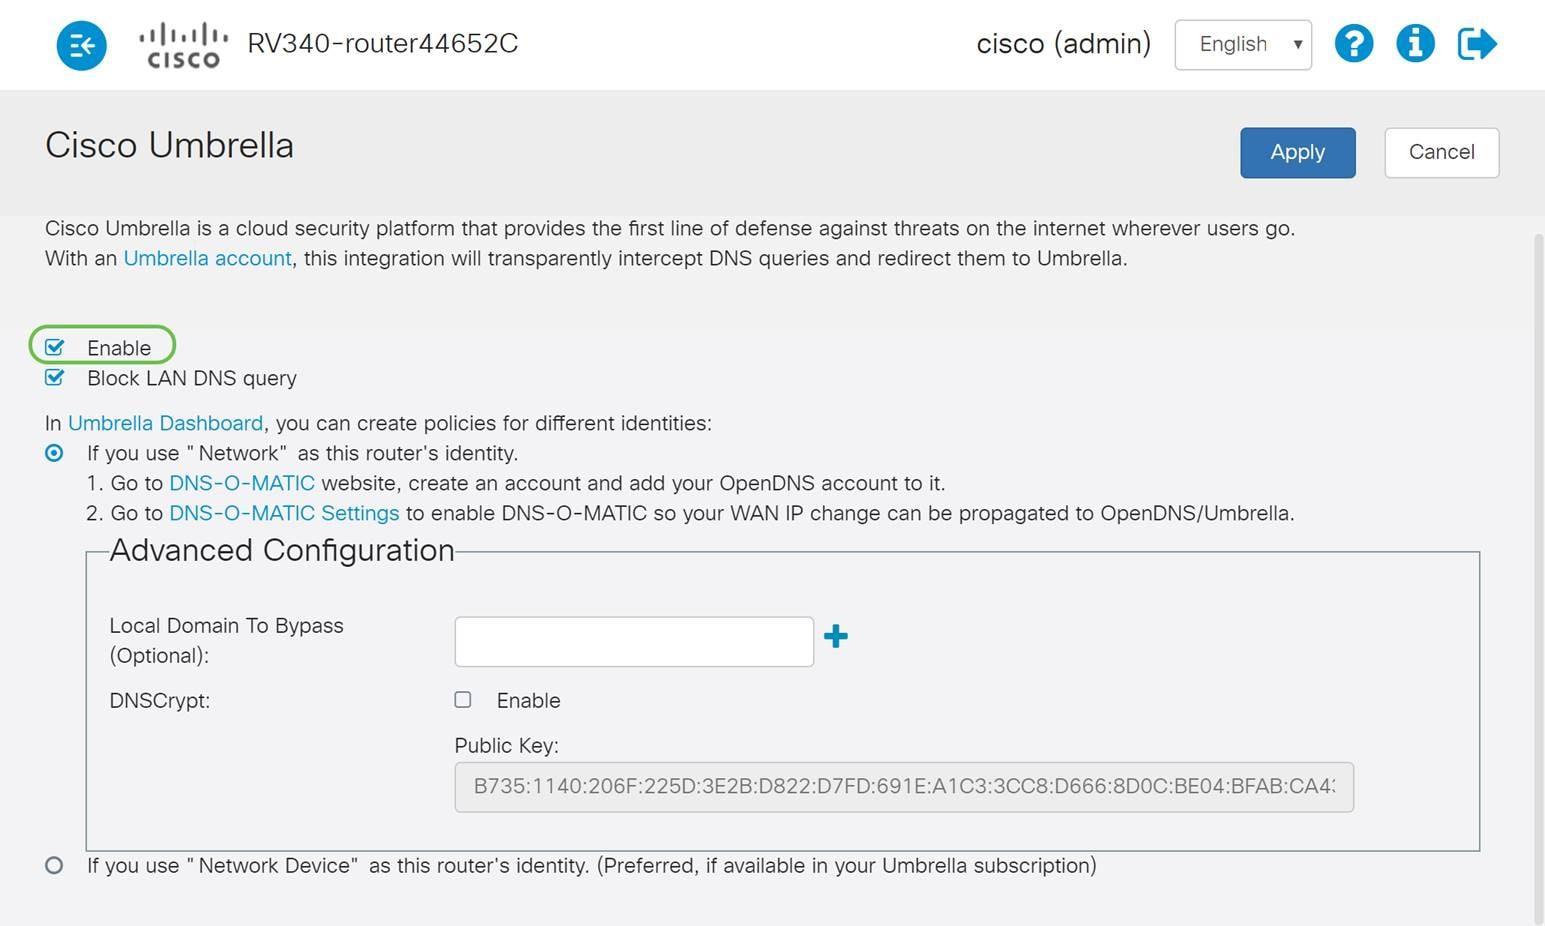 Configuring Cisco Umbrella on your Network via RV34x series